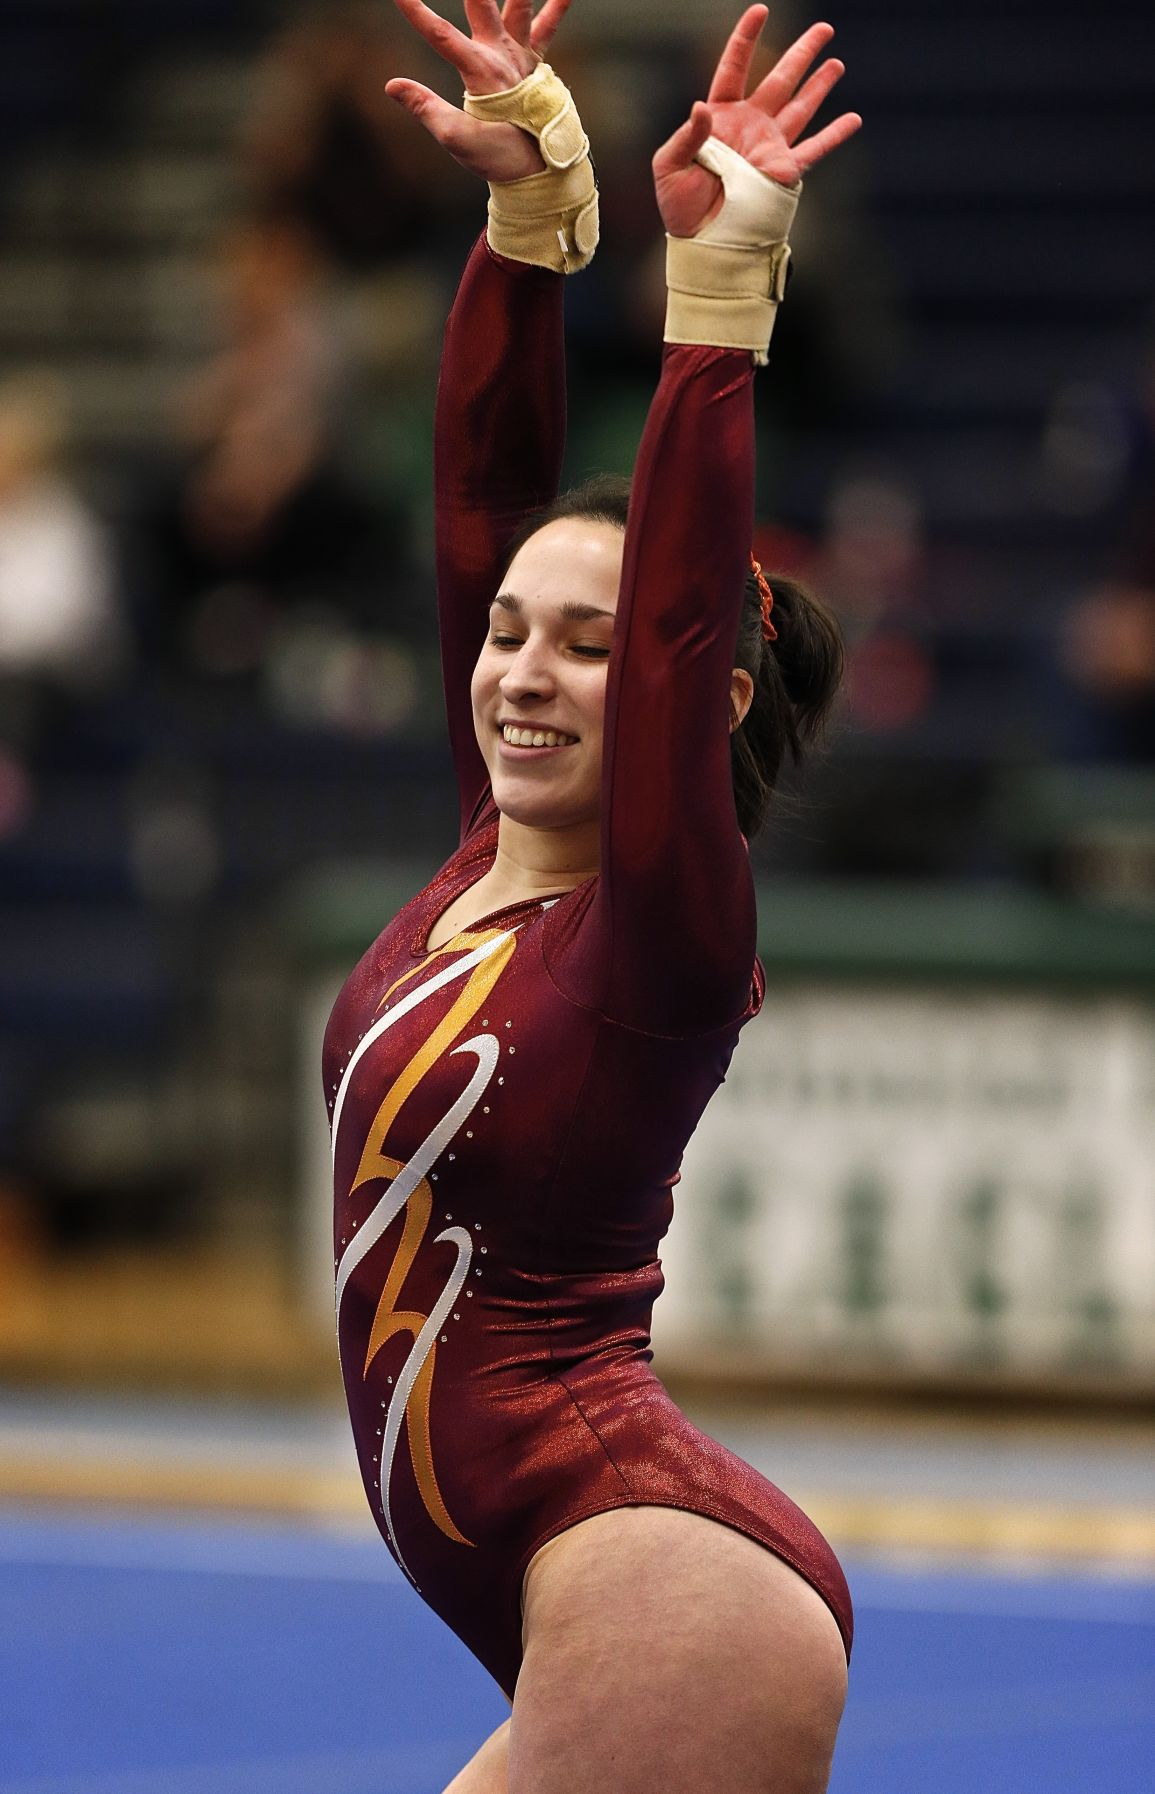 winterfest gymnastics meet 2014